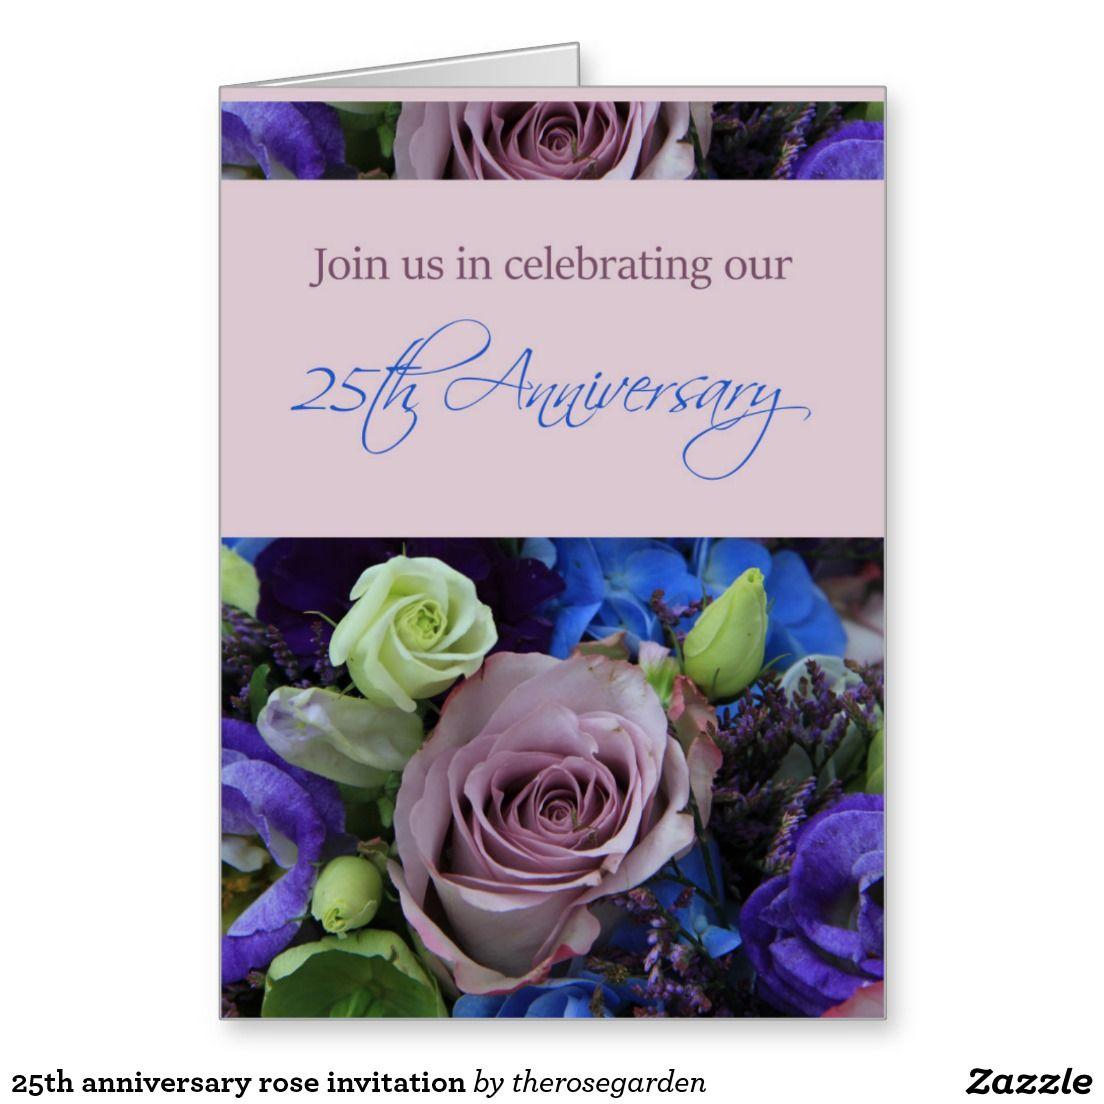 sapphire wedding anniversary invitations%0A   th anniversary rose invitation greeting card